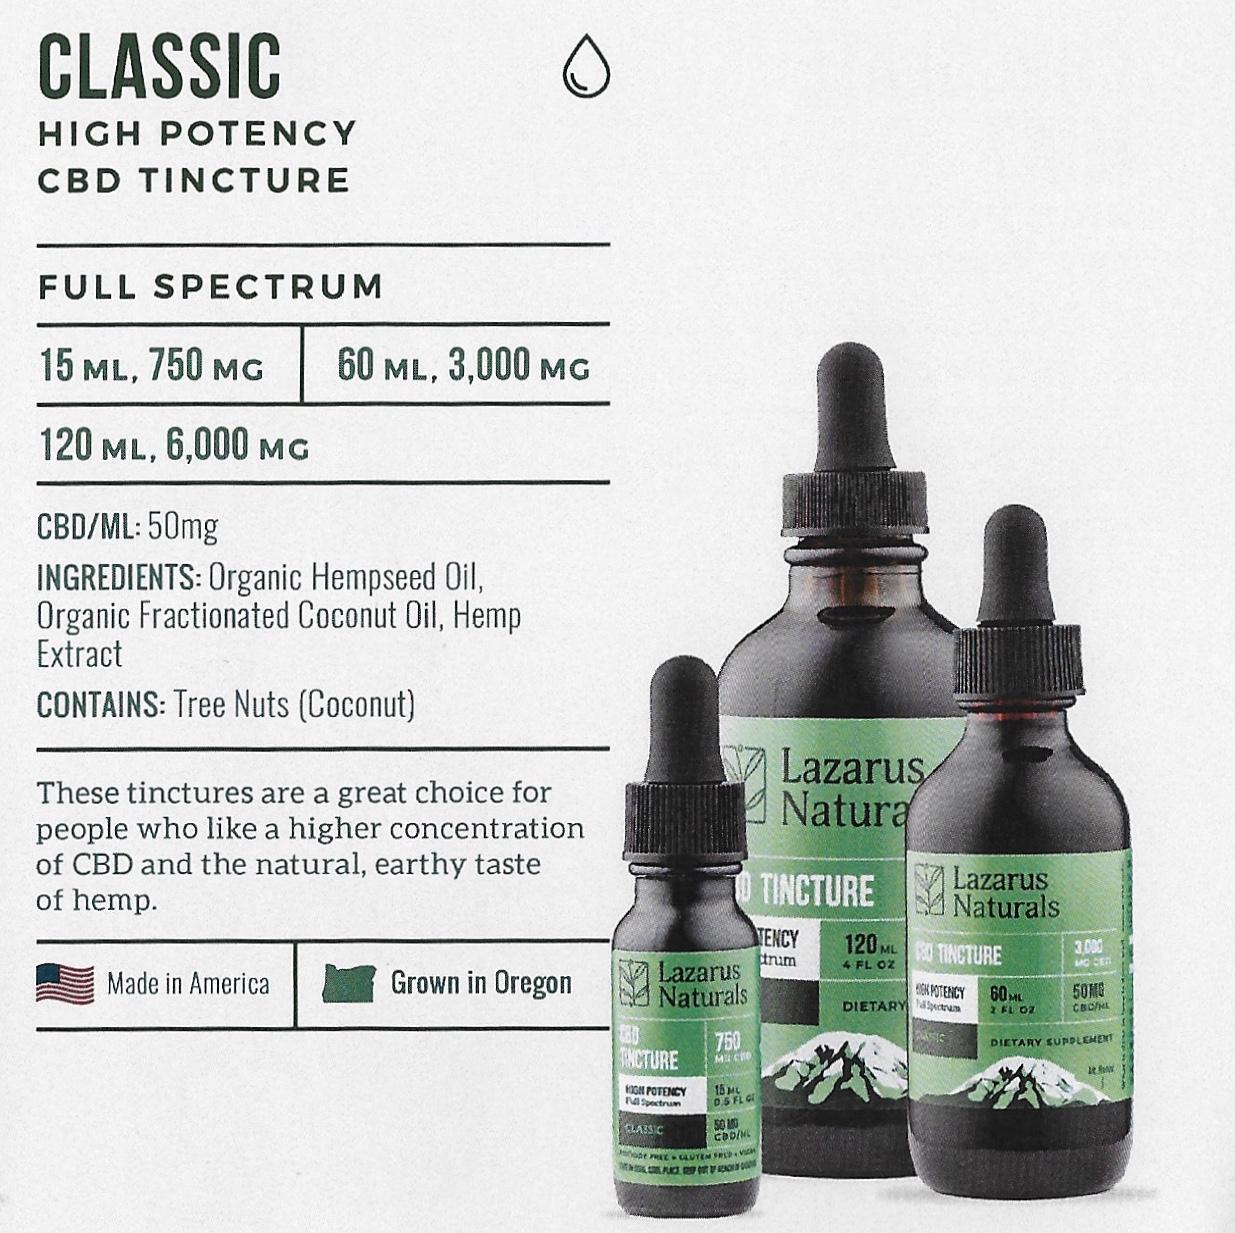 Cbd Oil Tincture Full Spectrum High Potency Lazarus